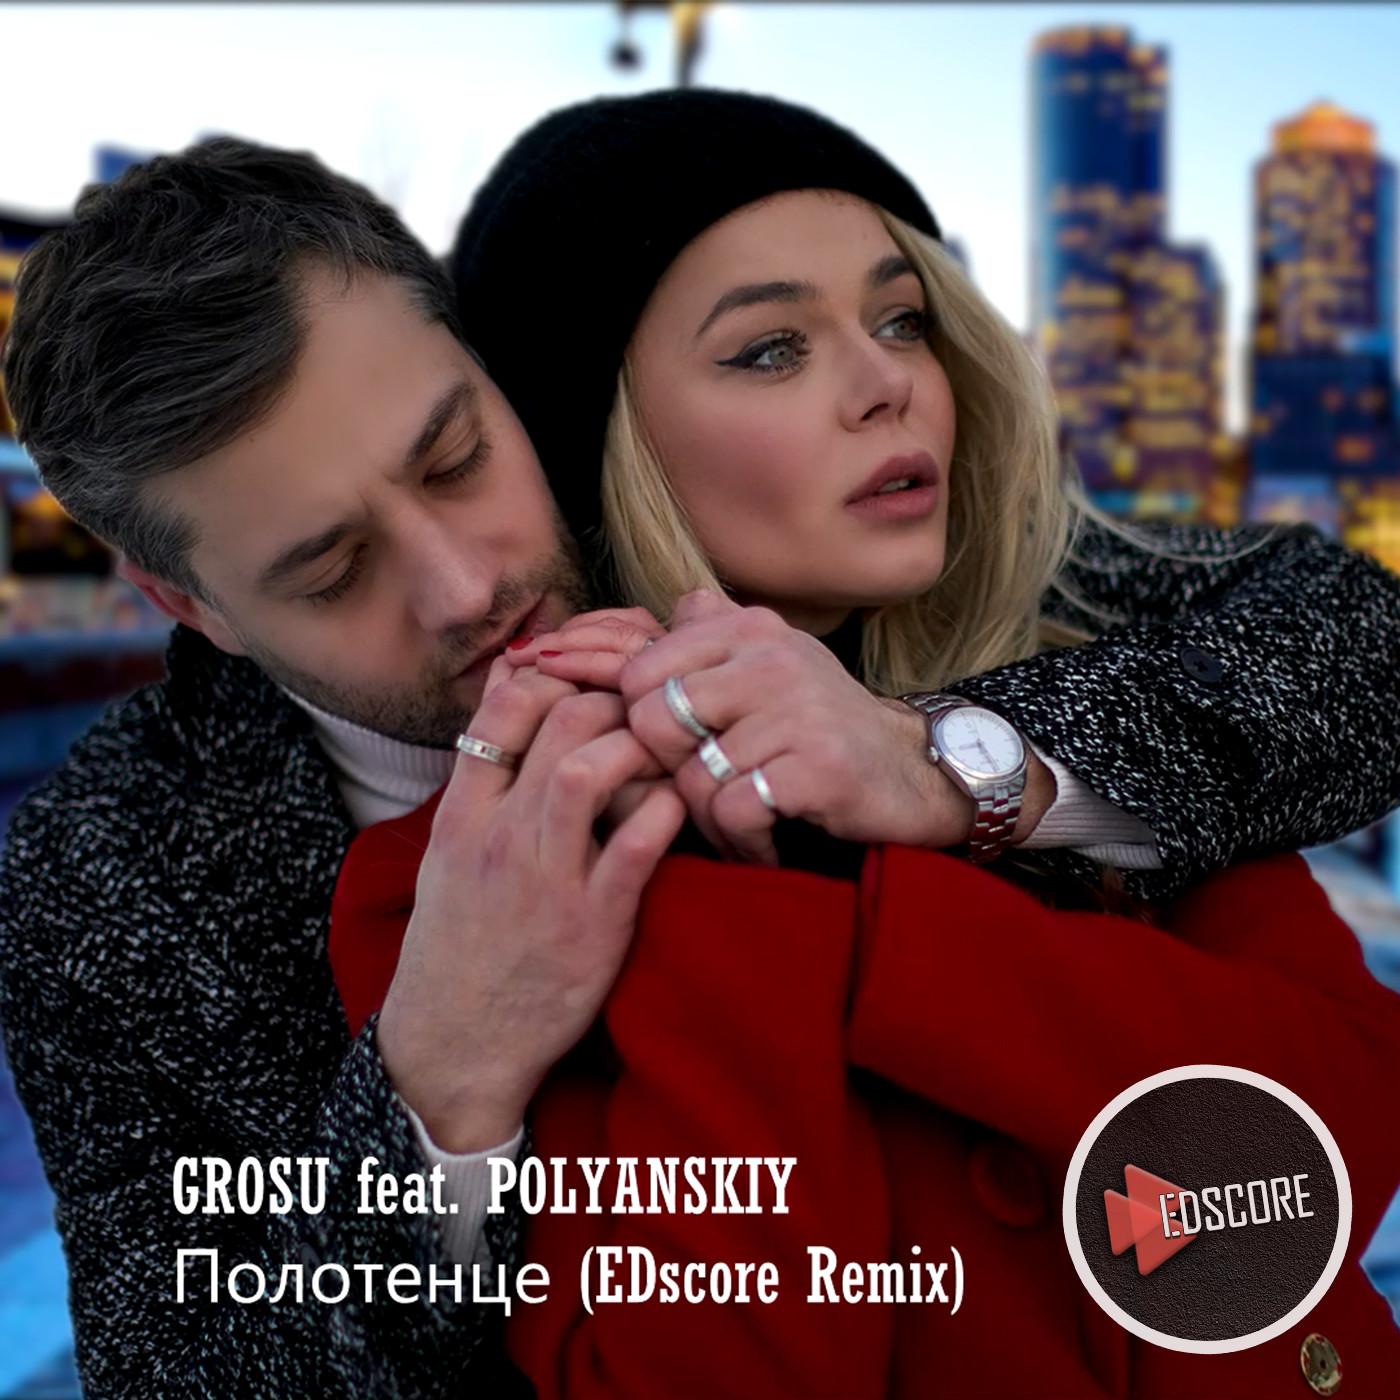 GROSU feat. POLYANSKIY — Полотенце (EDscore Remix)